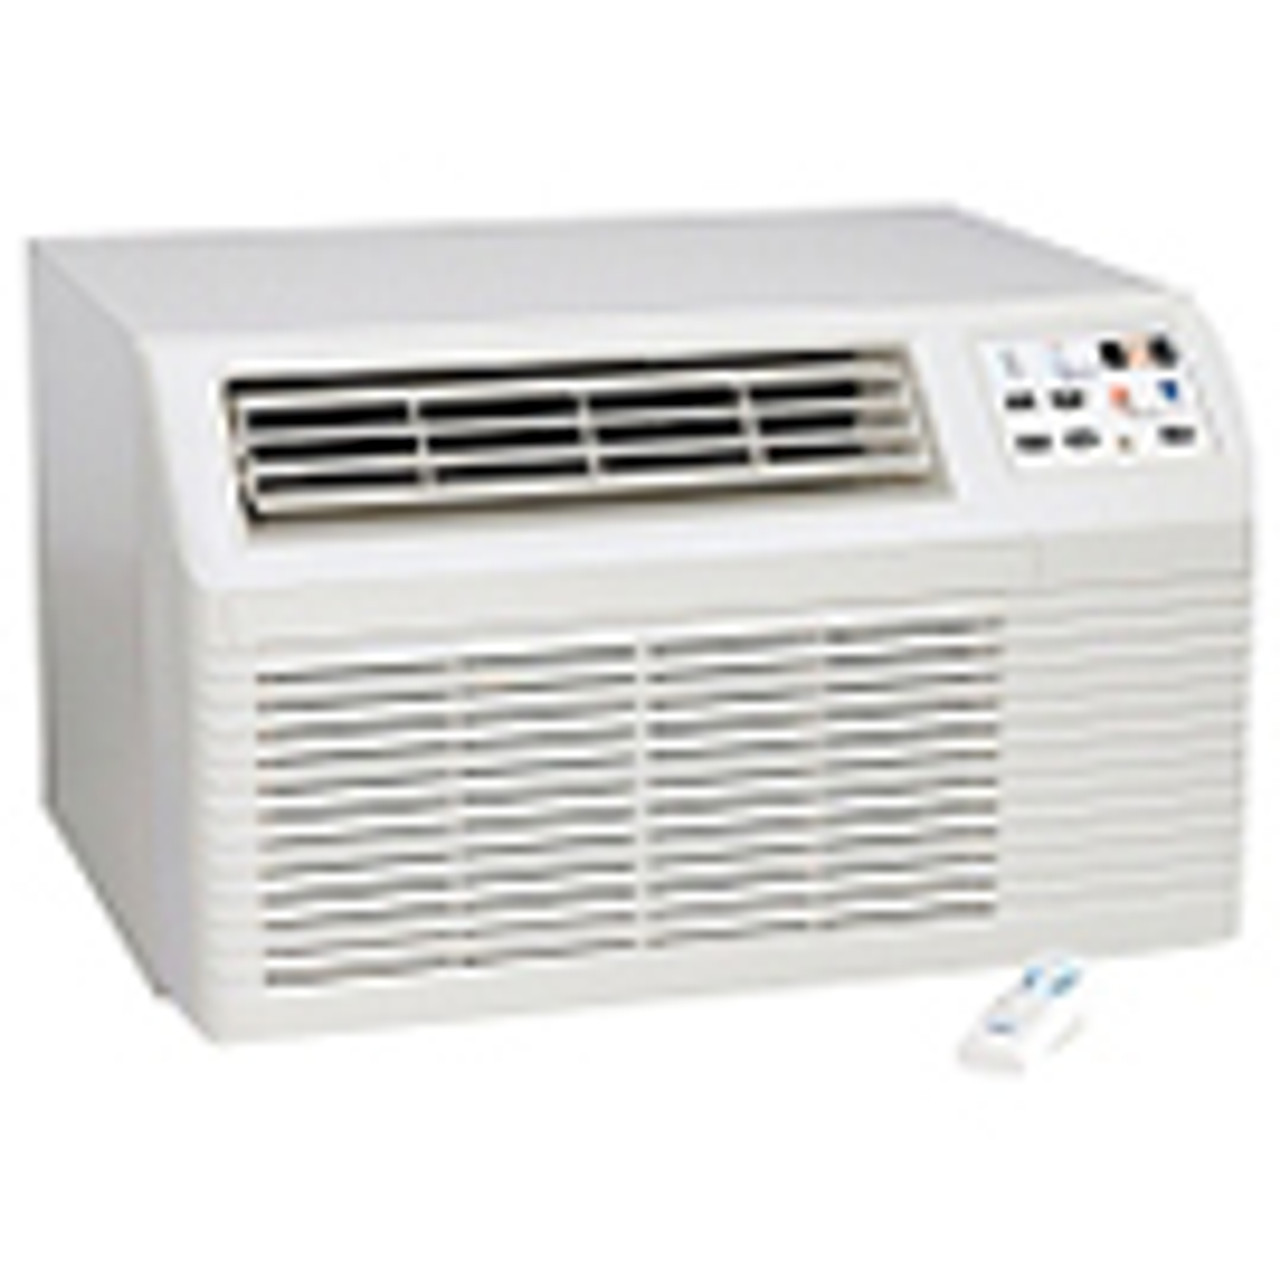 Amana PBE Thru Wall AC Units With Electric Heat